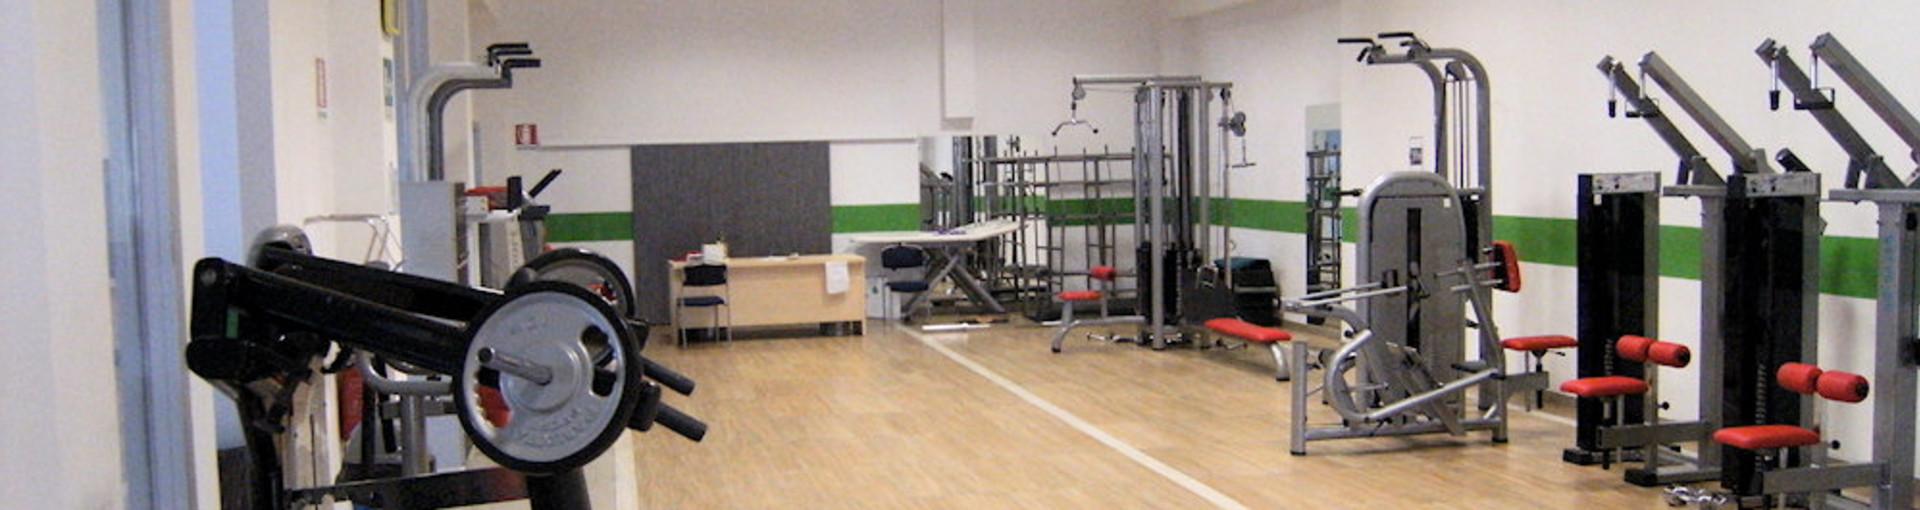 New Fitness - Modena